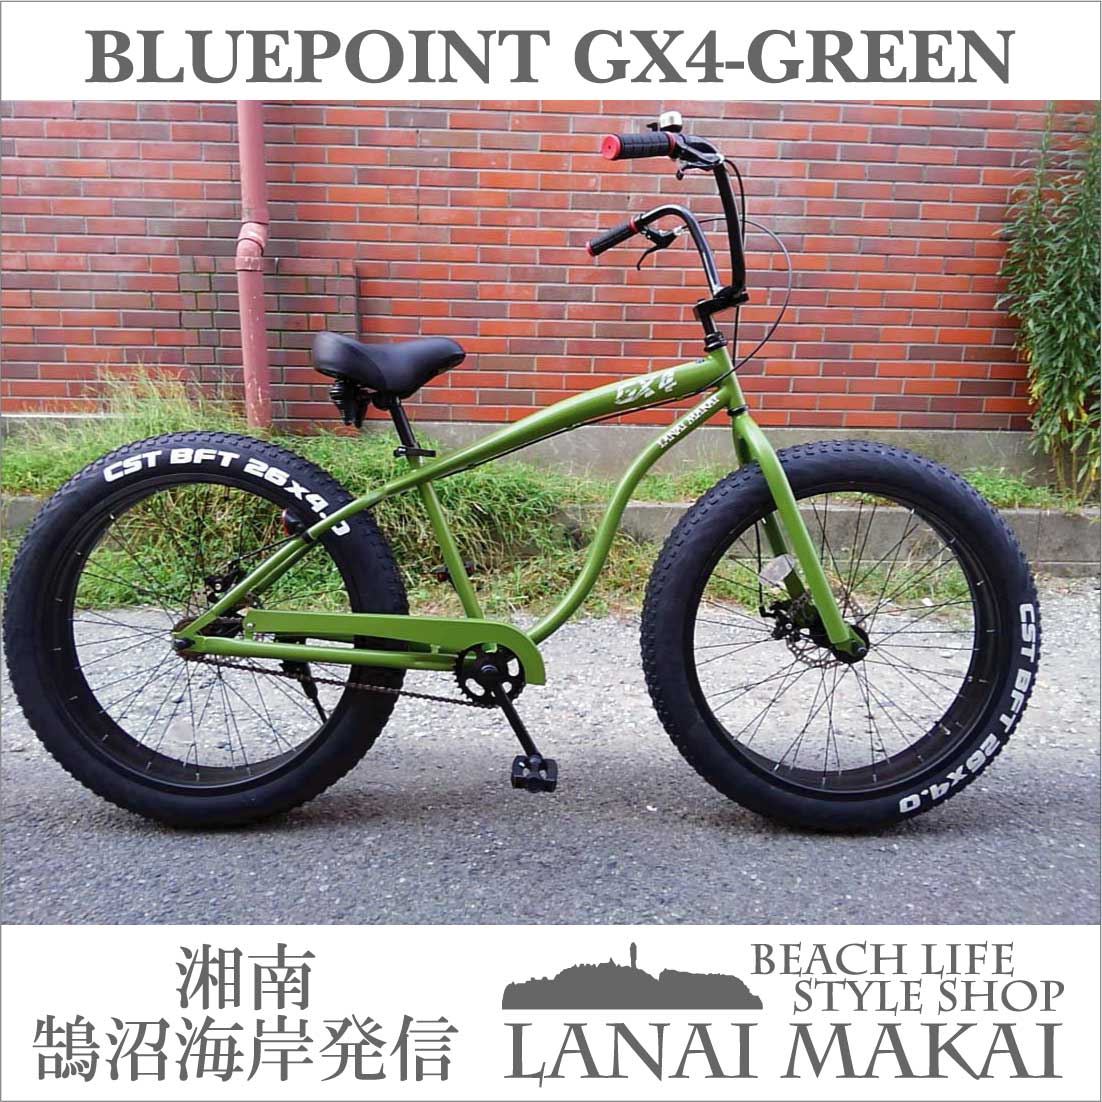 "【BLUEPOINT】""GX4-BeachCruiser-FATBIKE""color:グリーン湘南鵠沼海岸発信26インチビーチクルーザーファットバイク自転車 ファットバイク ビーチクルーザー 極太"